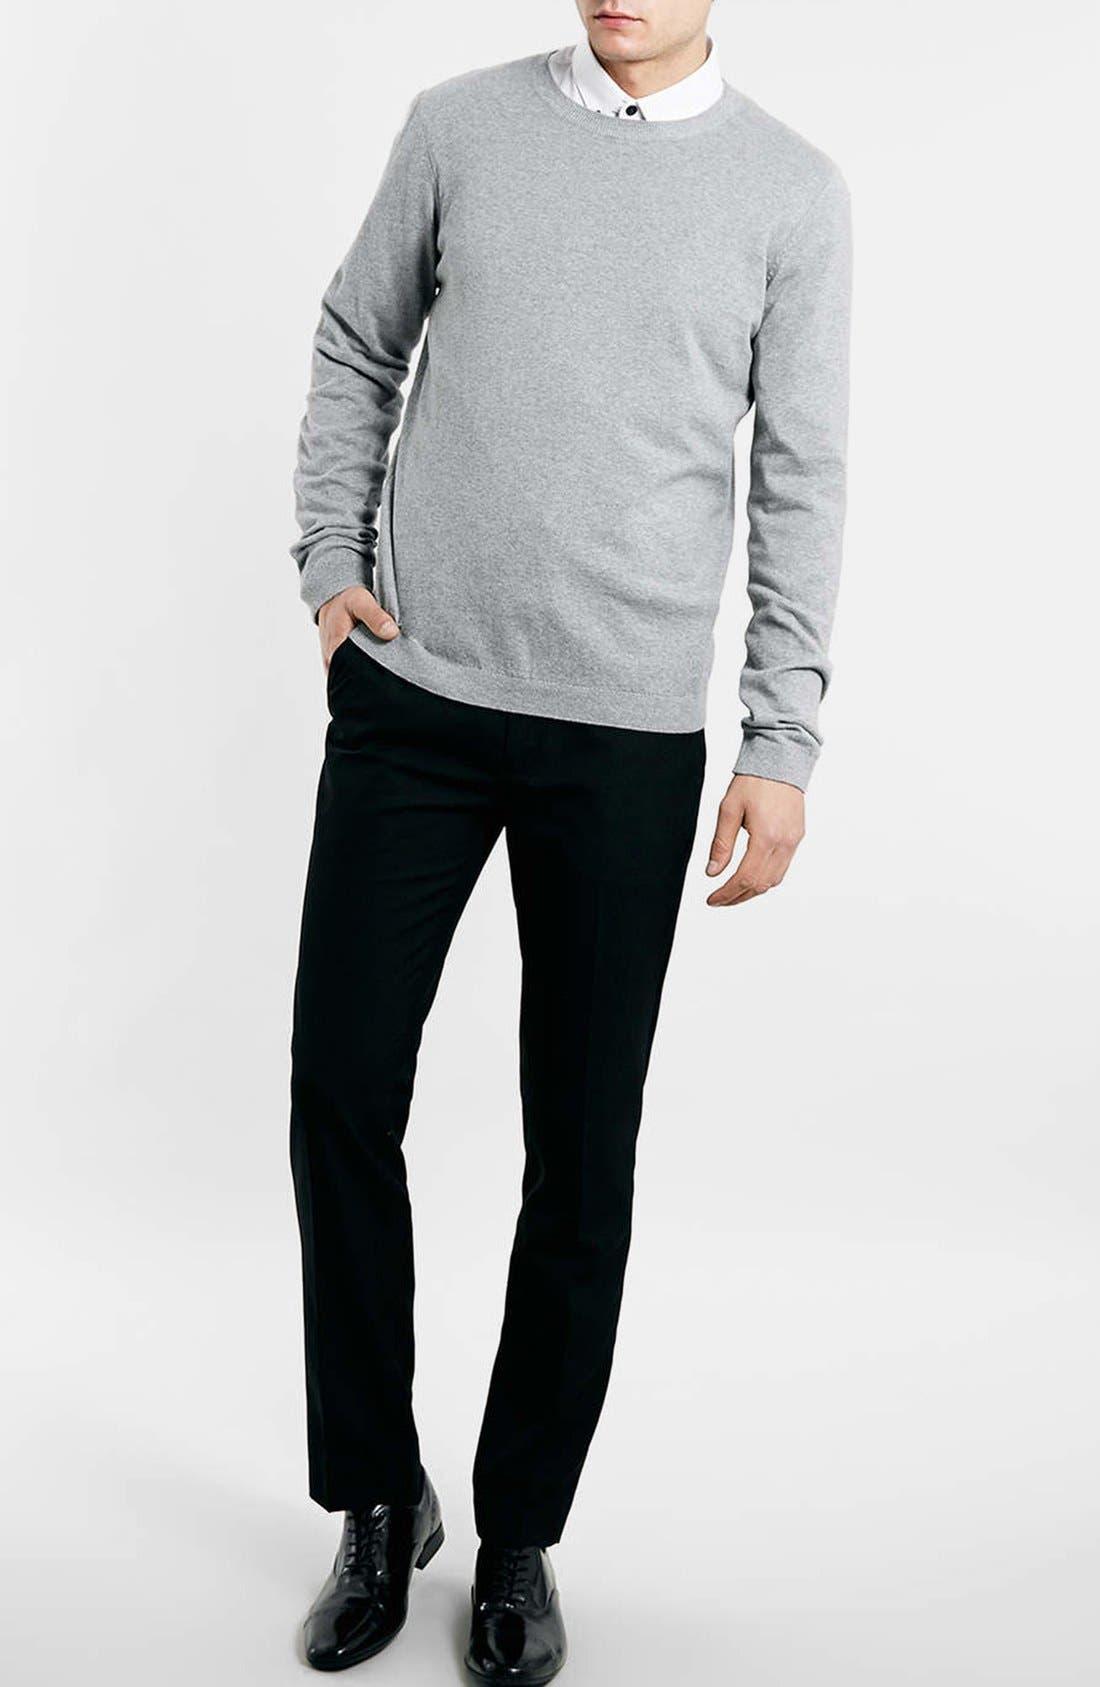 Black Skinny Fit Trousers,                             Alternate thumbnail 2, color,                             001